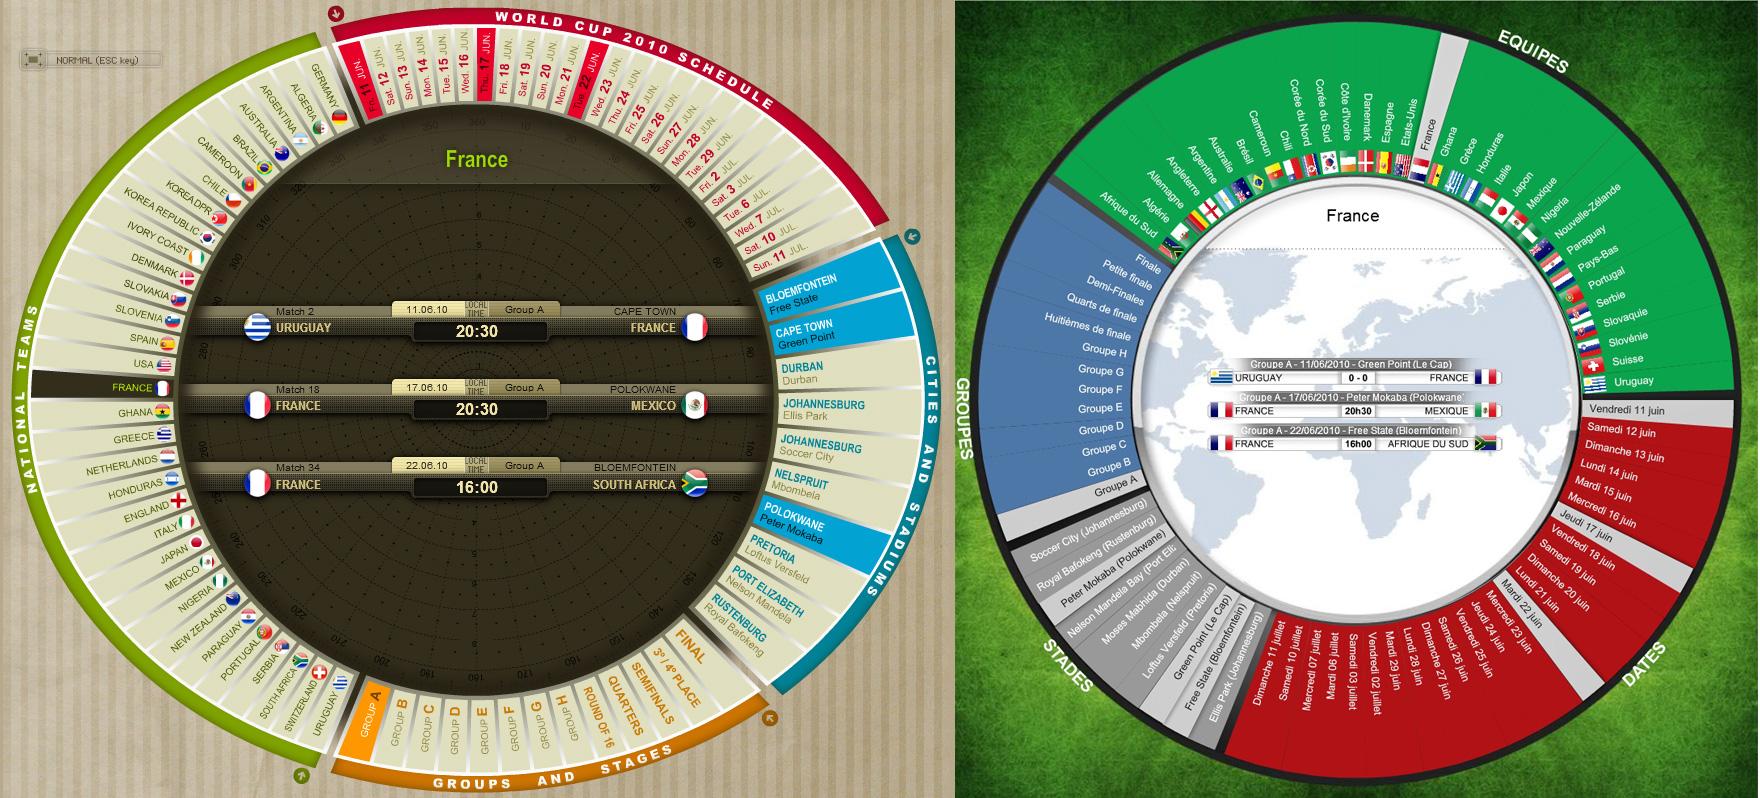 Comment football365.com vole les bonnes idées de Marca.com !